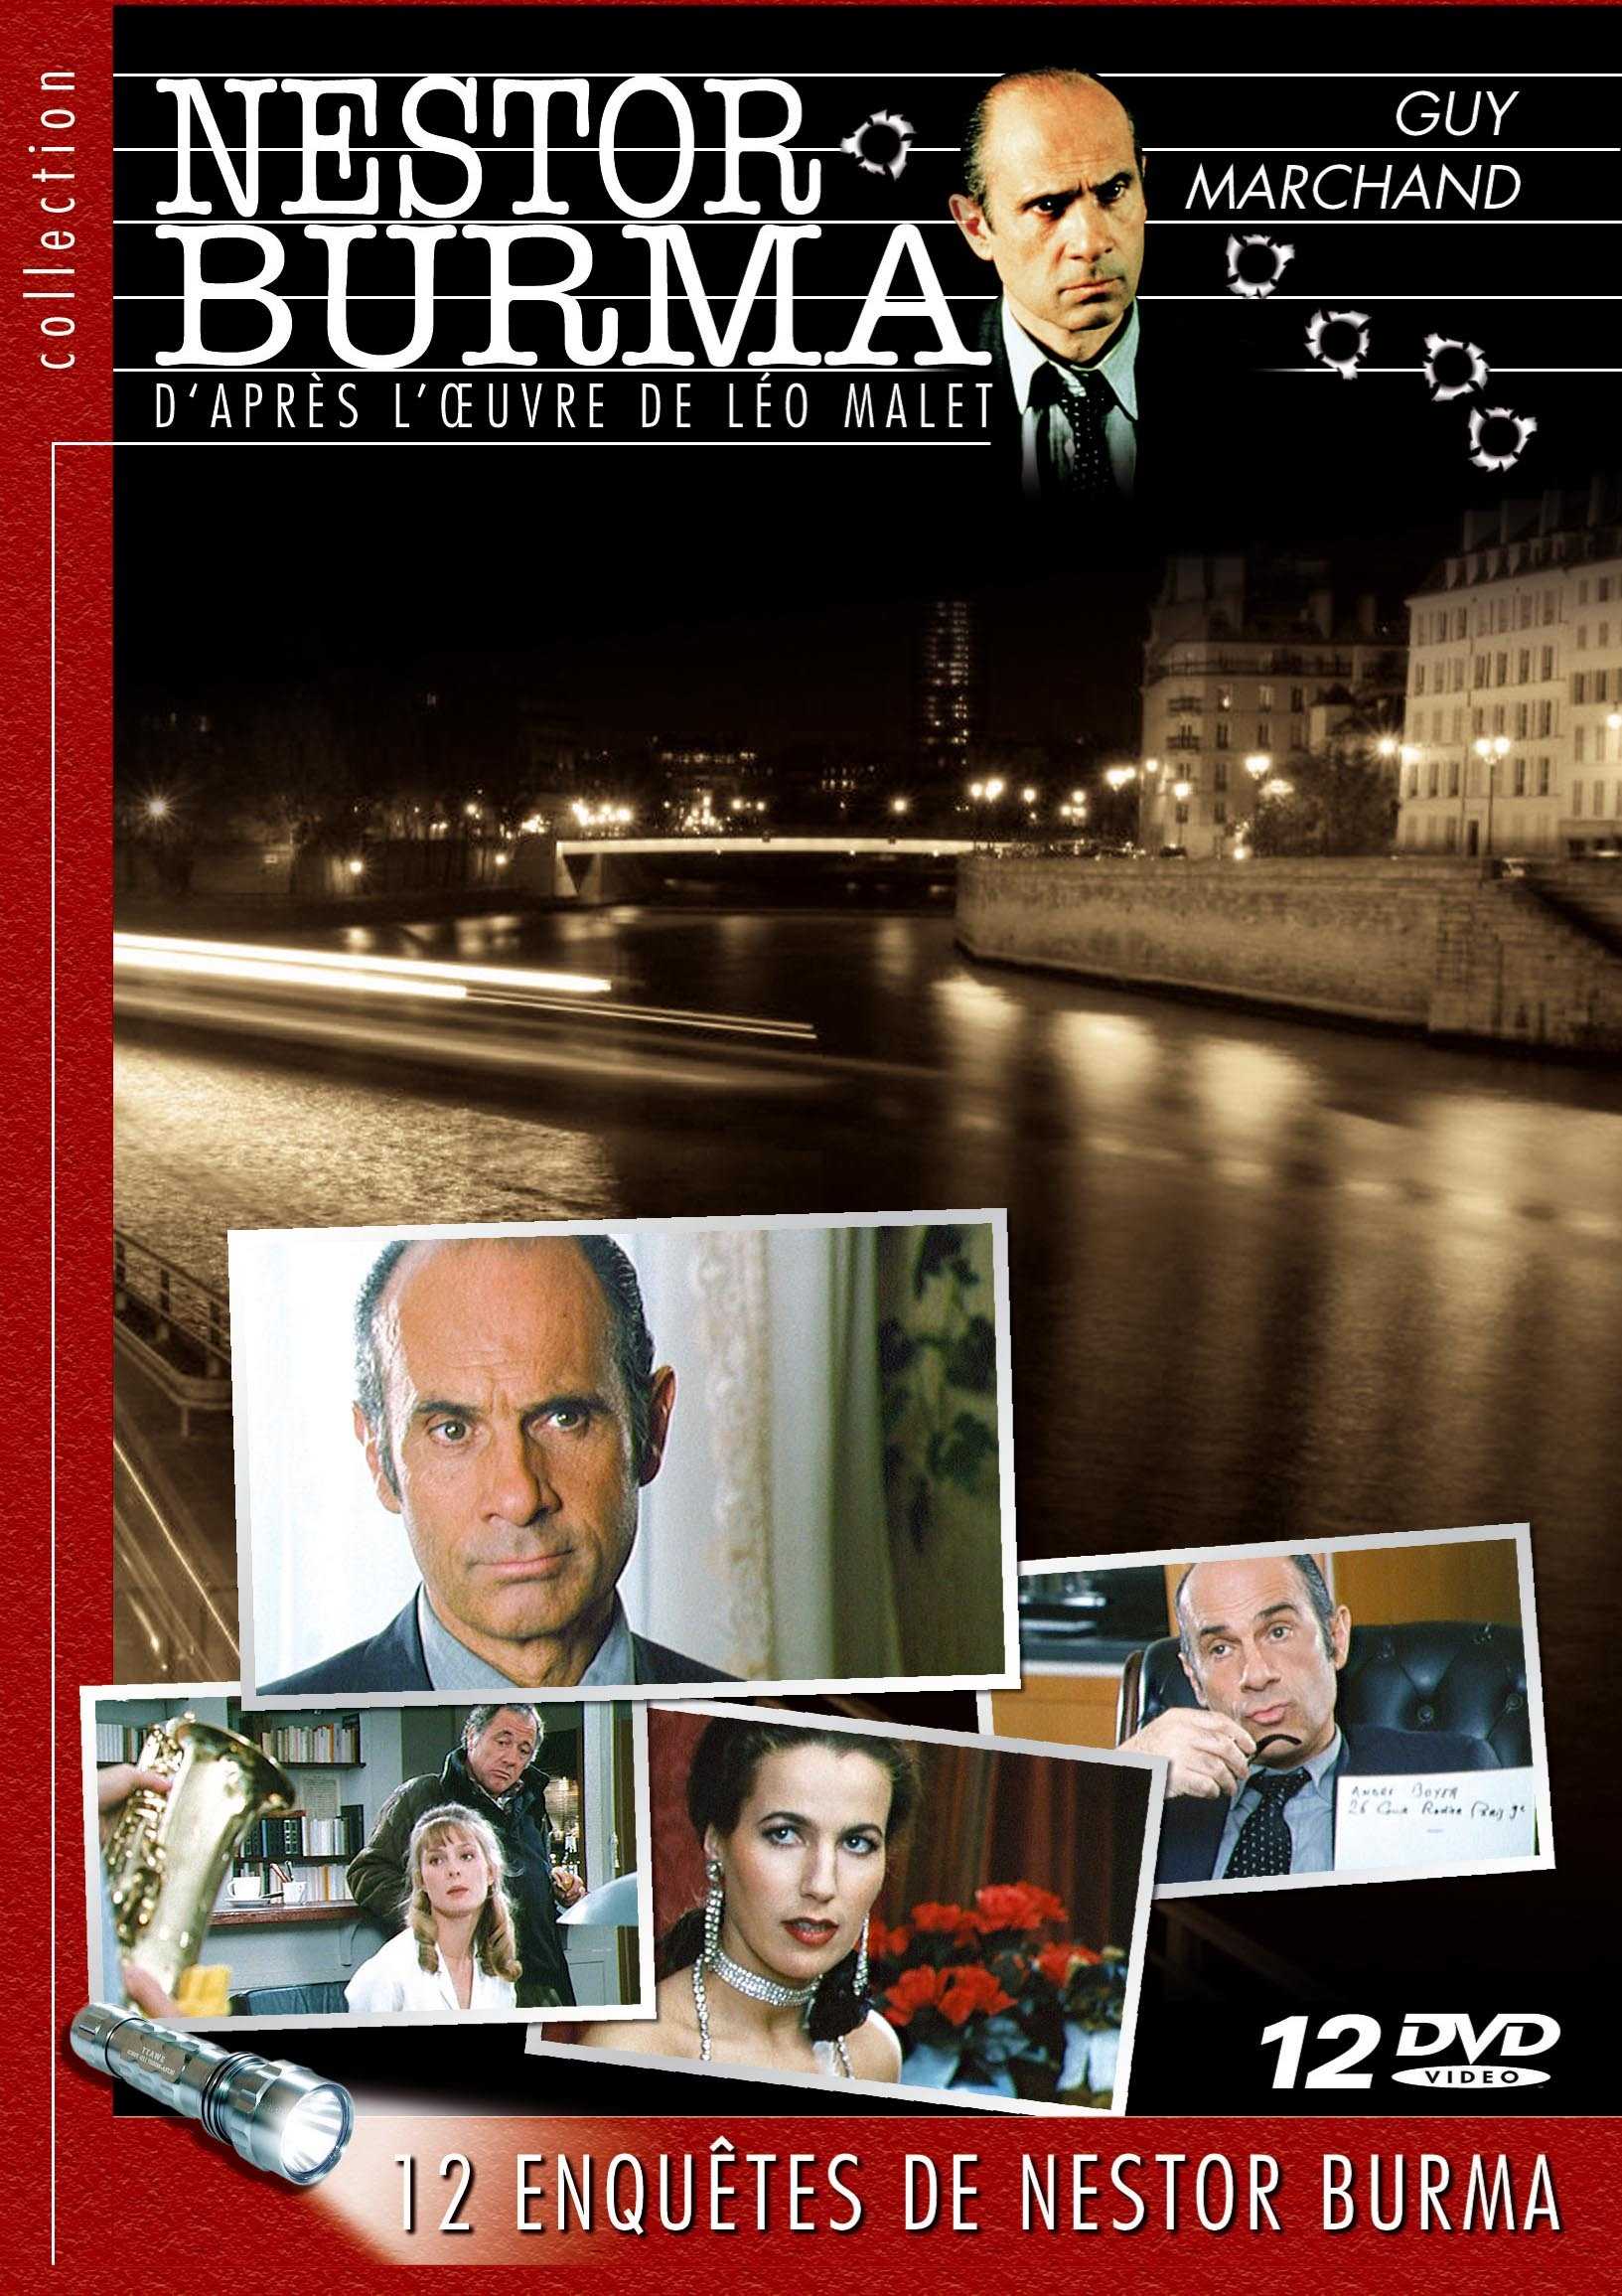 NESTOR BURMA VOL 2 - 12 DVD